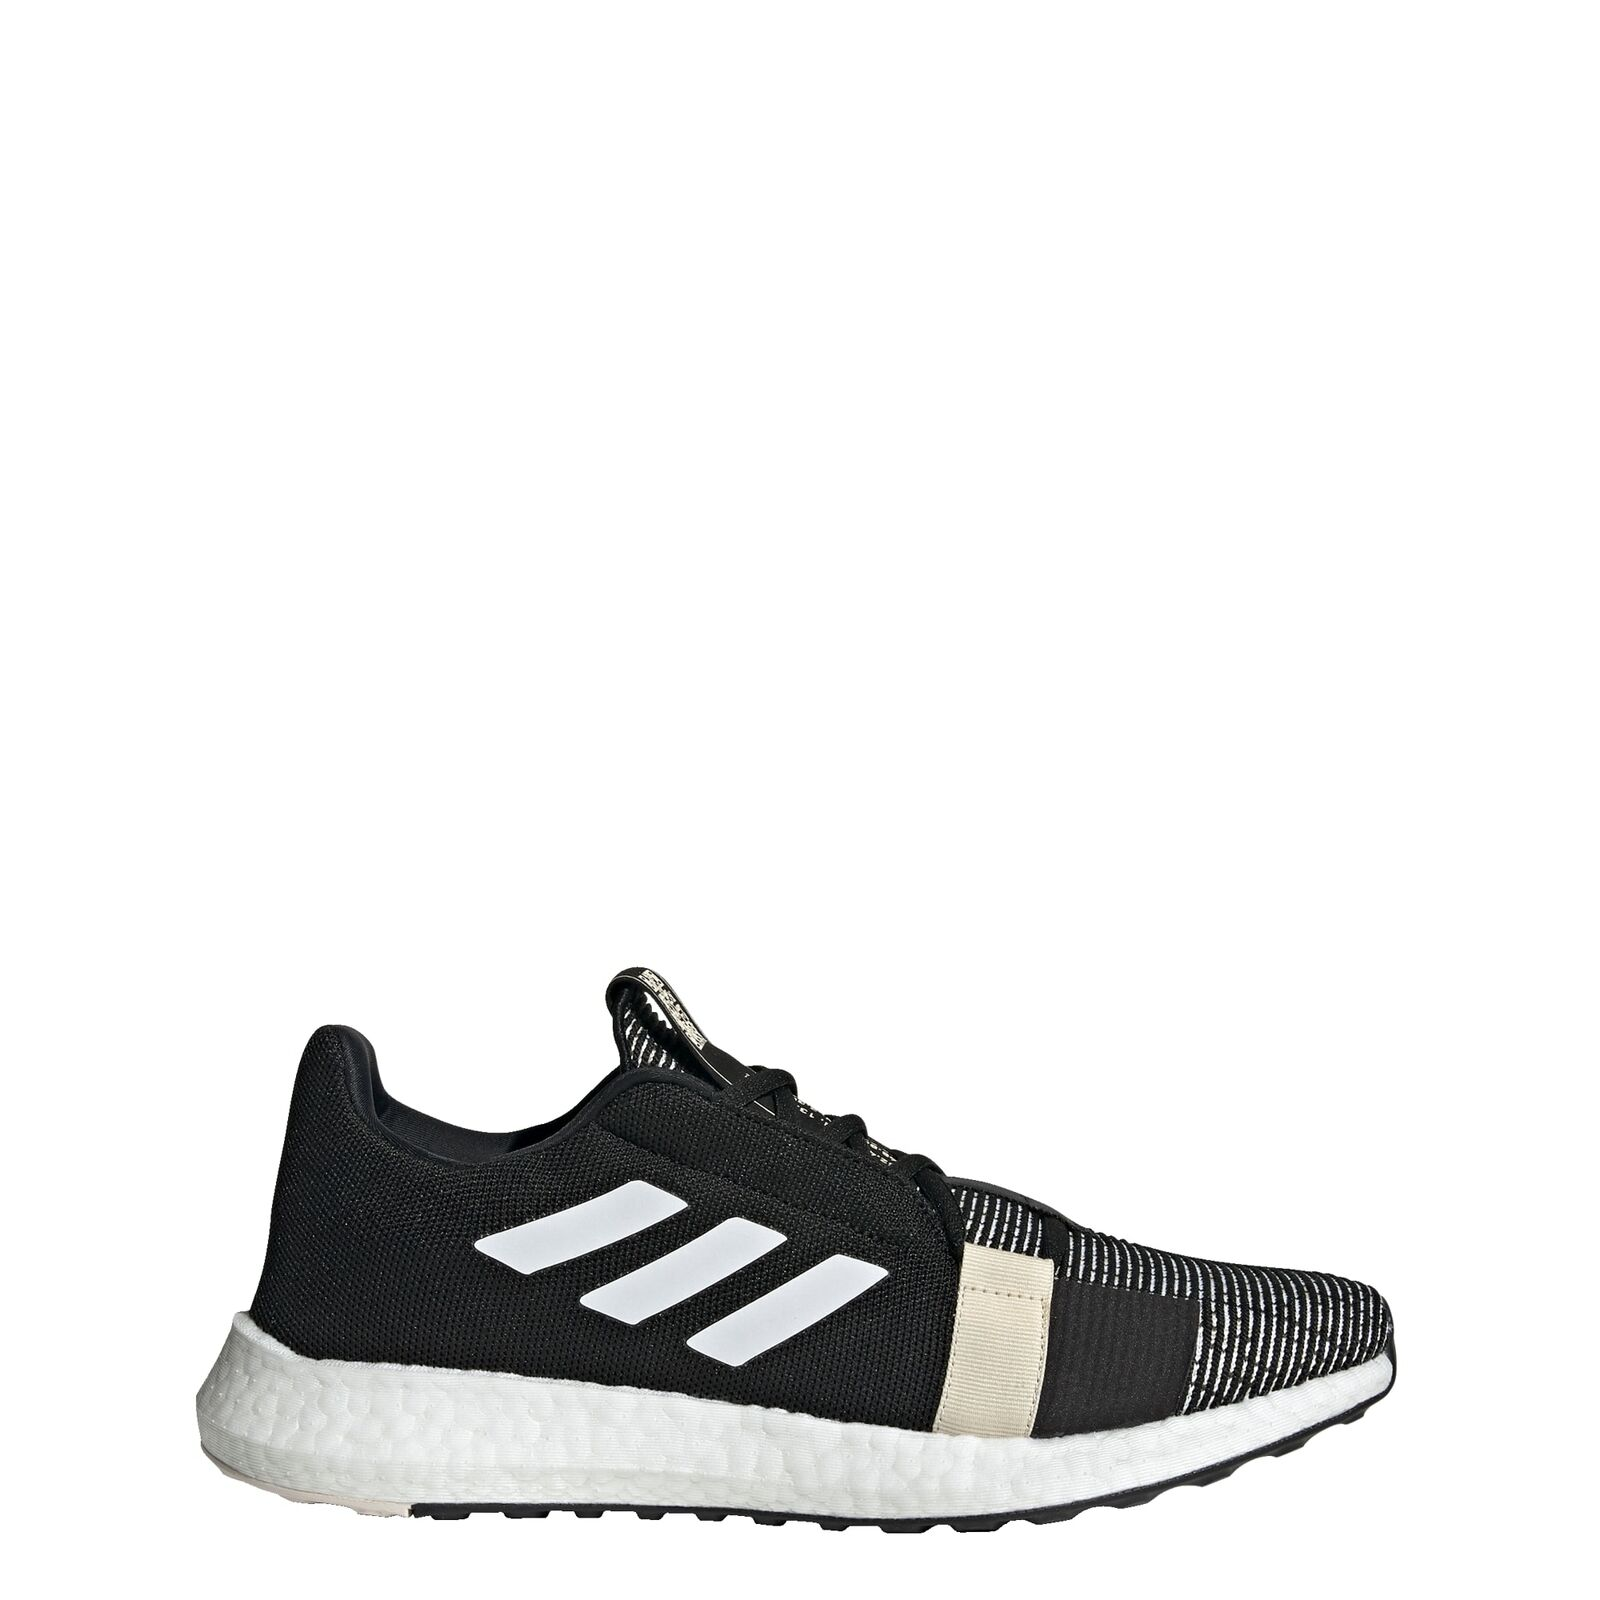 Adidas Performance Senseboost Go Schuh Herren